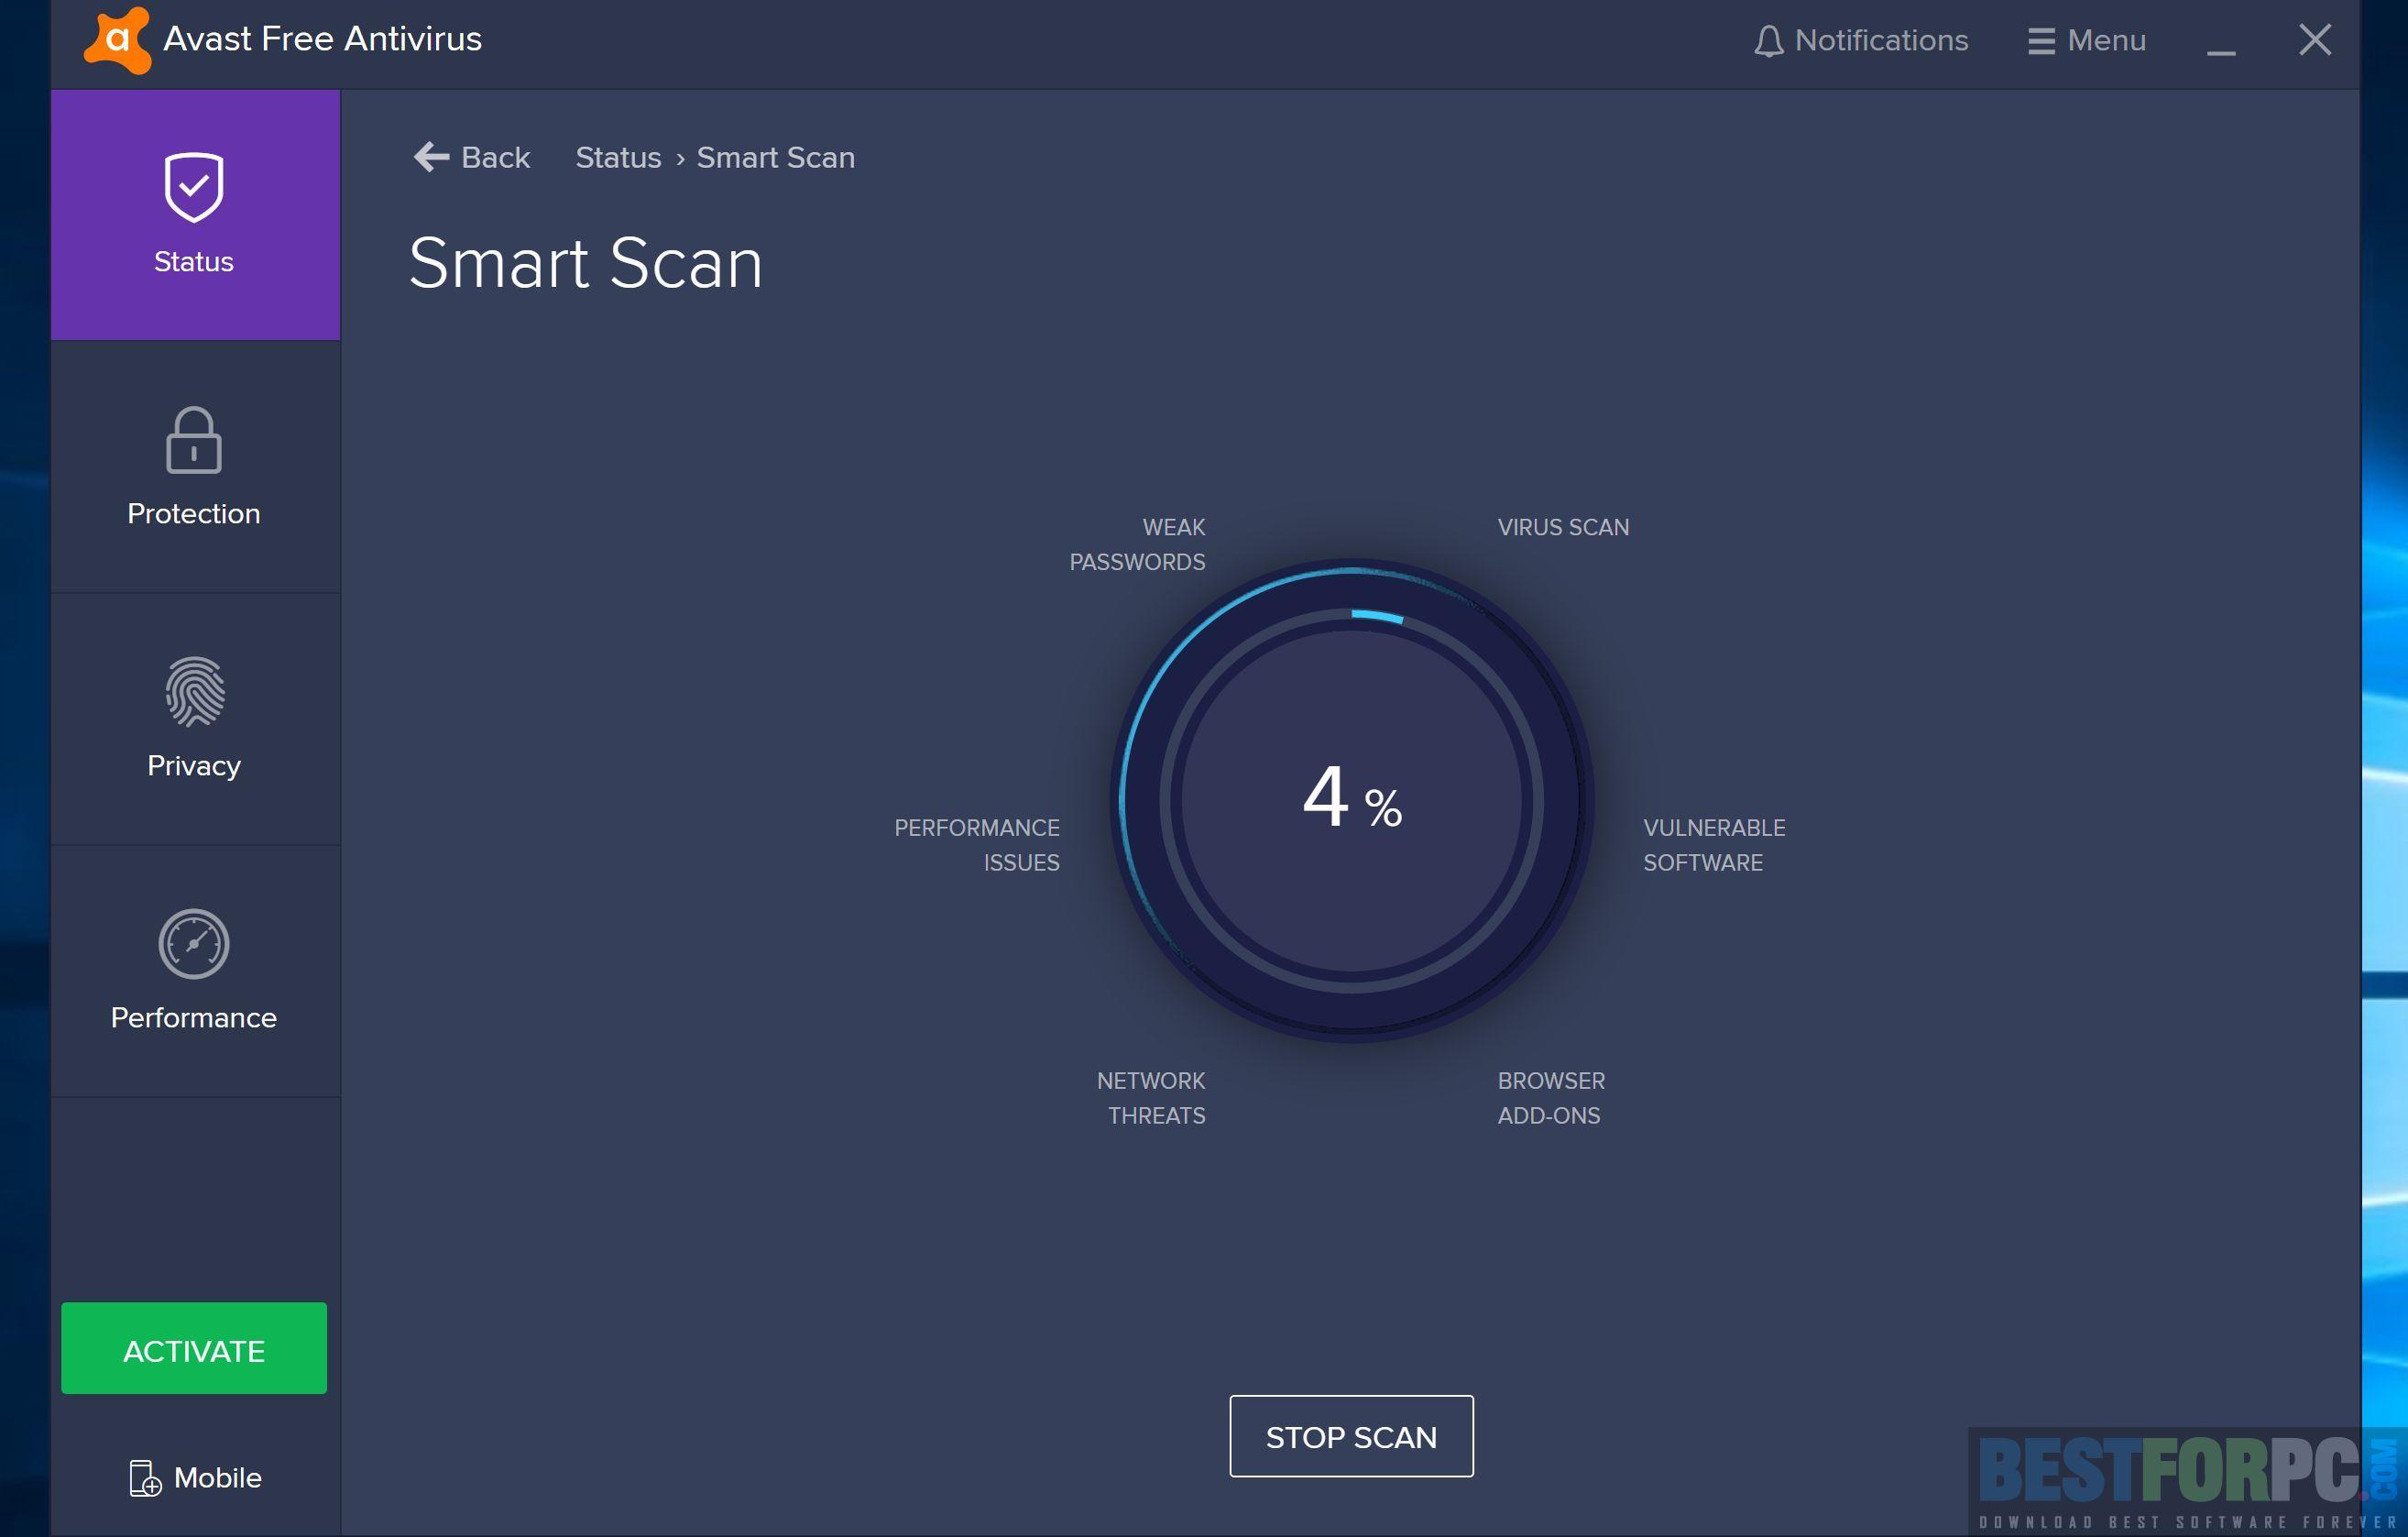 Avast Pro 2020 Antivirus Download